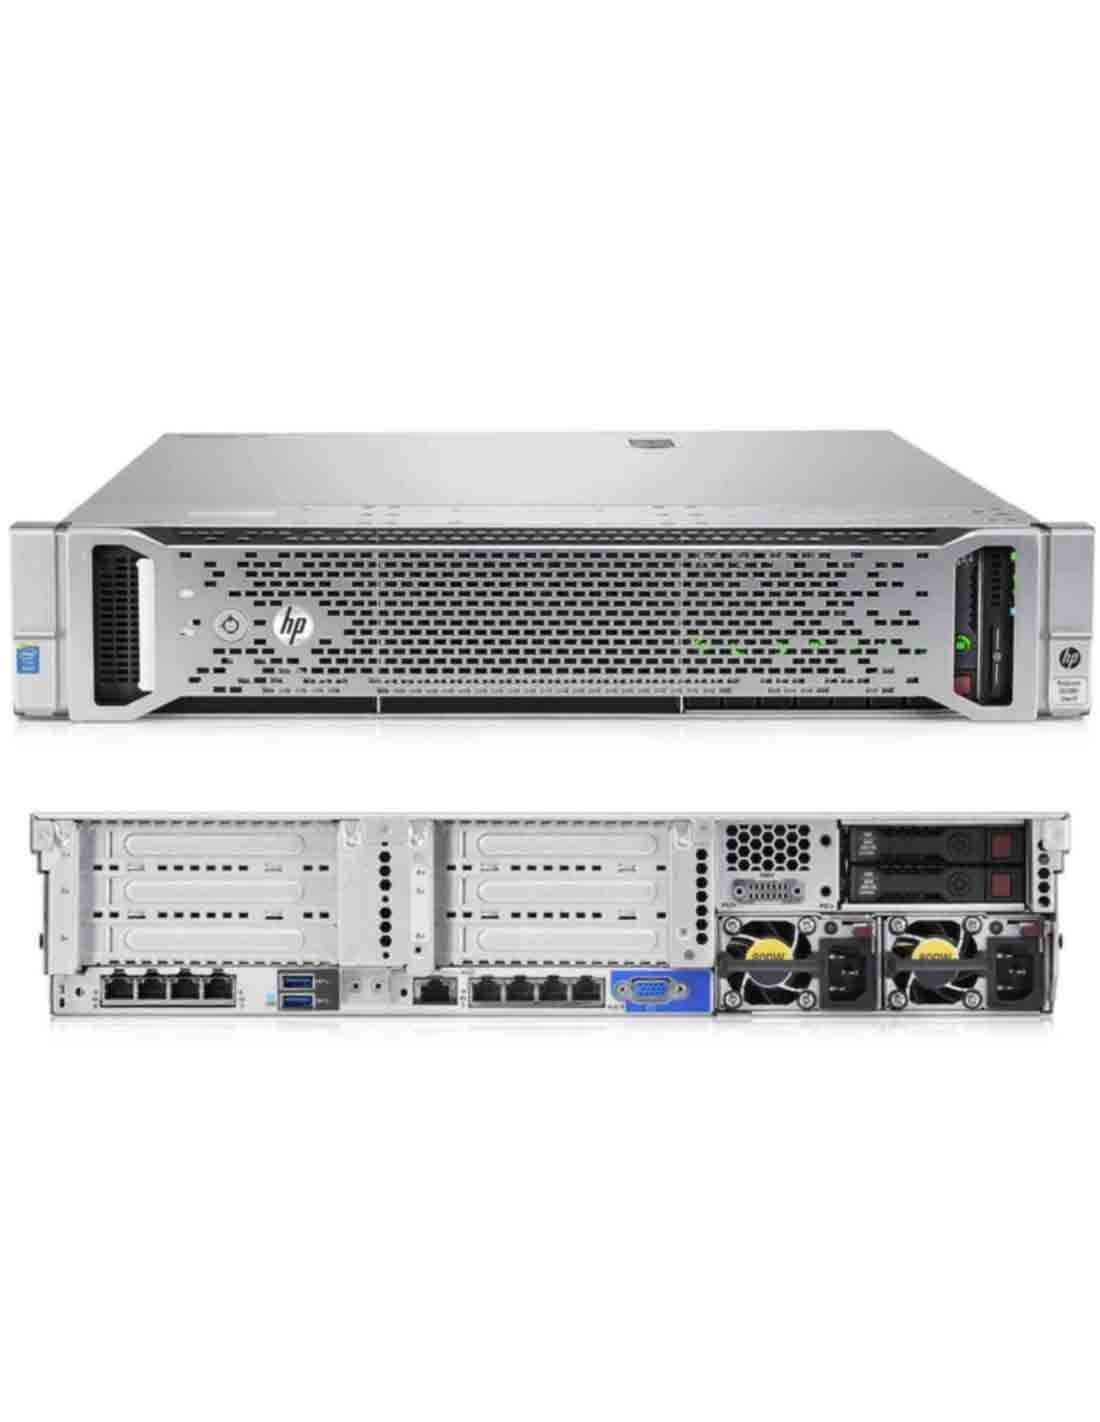 HP ProLiant DL380 Gen9 E5-2620v4 Dubai Online Store